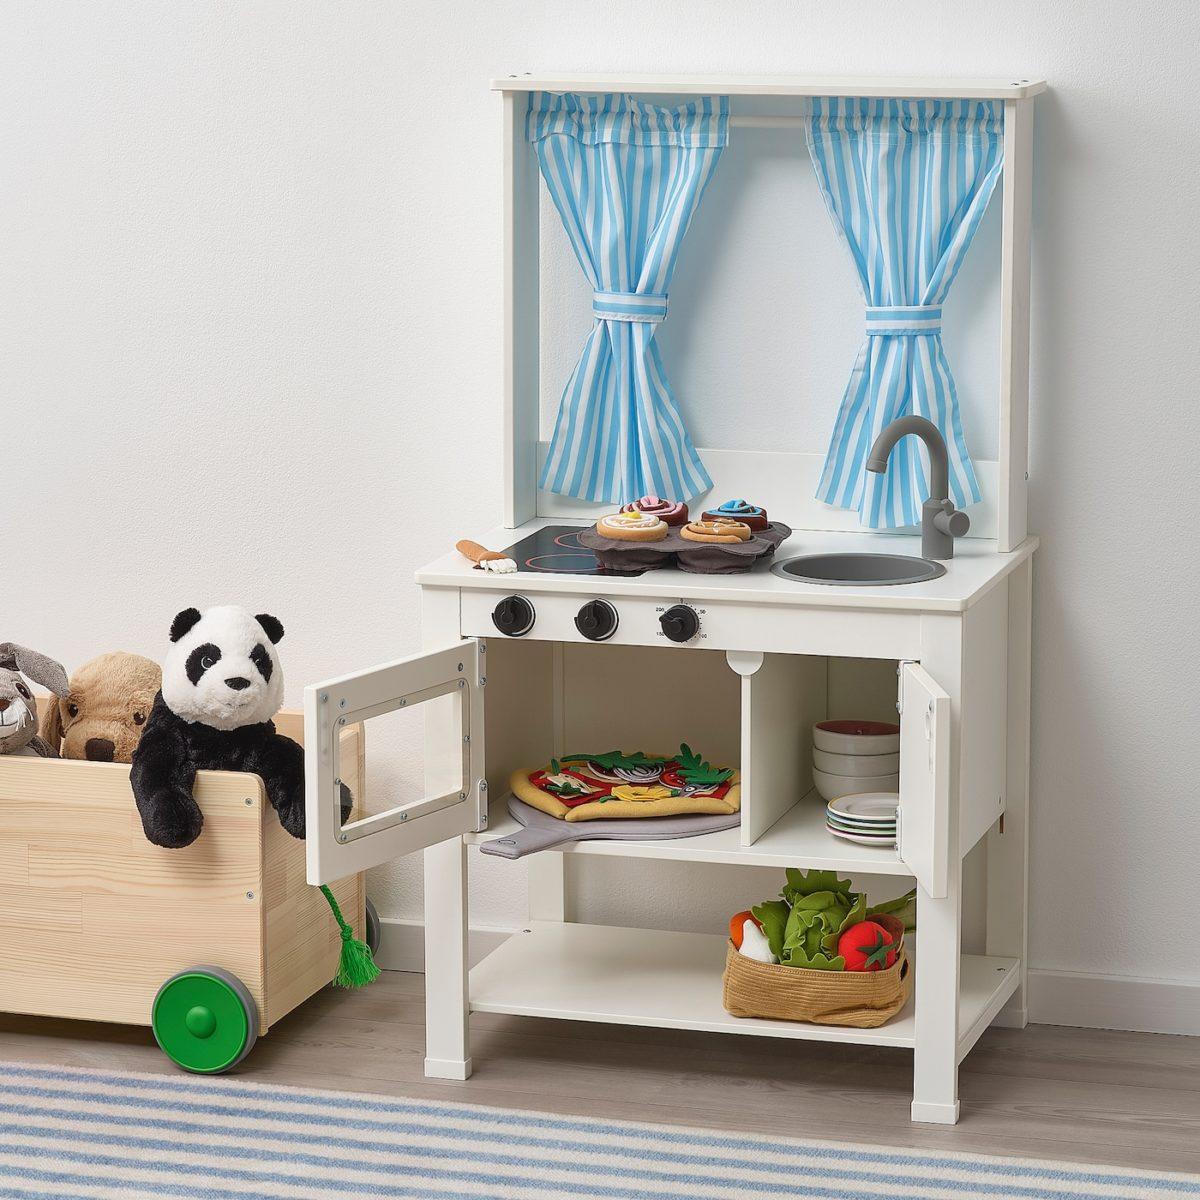 ikea-giocattolo-cucina